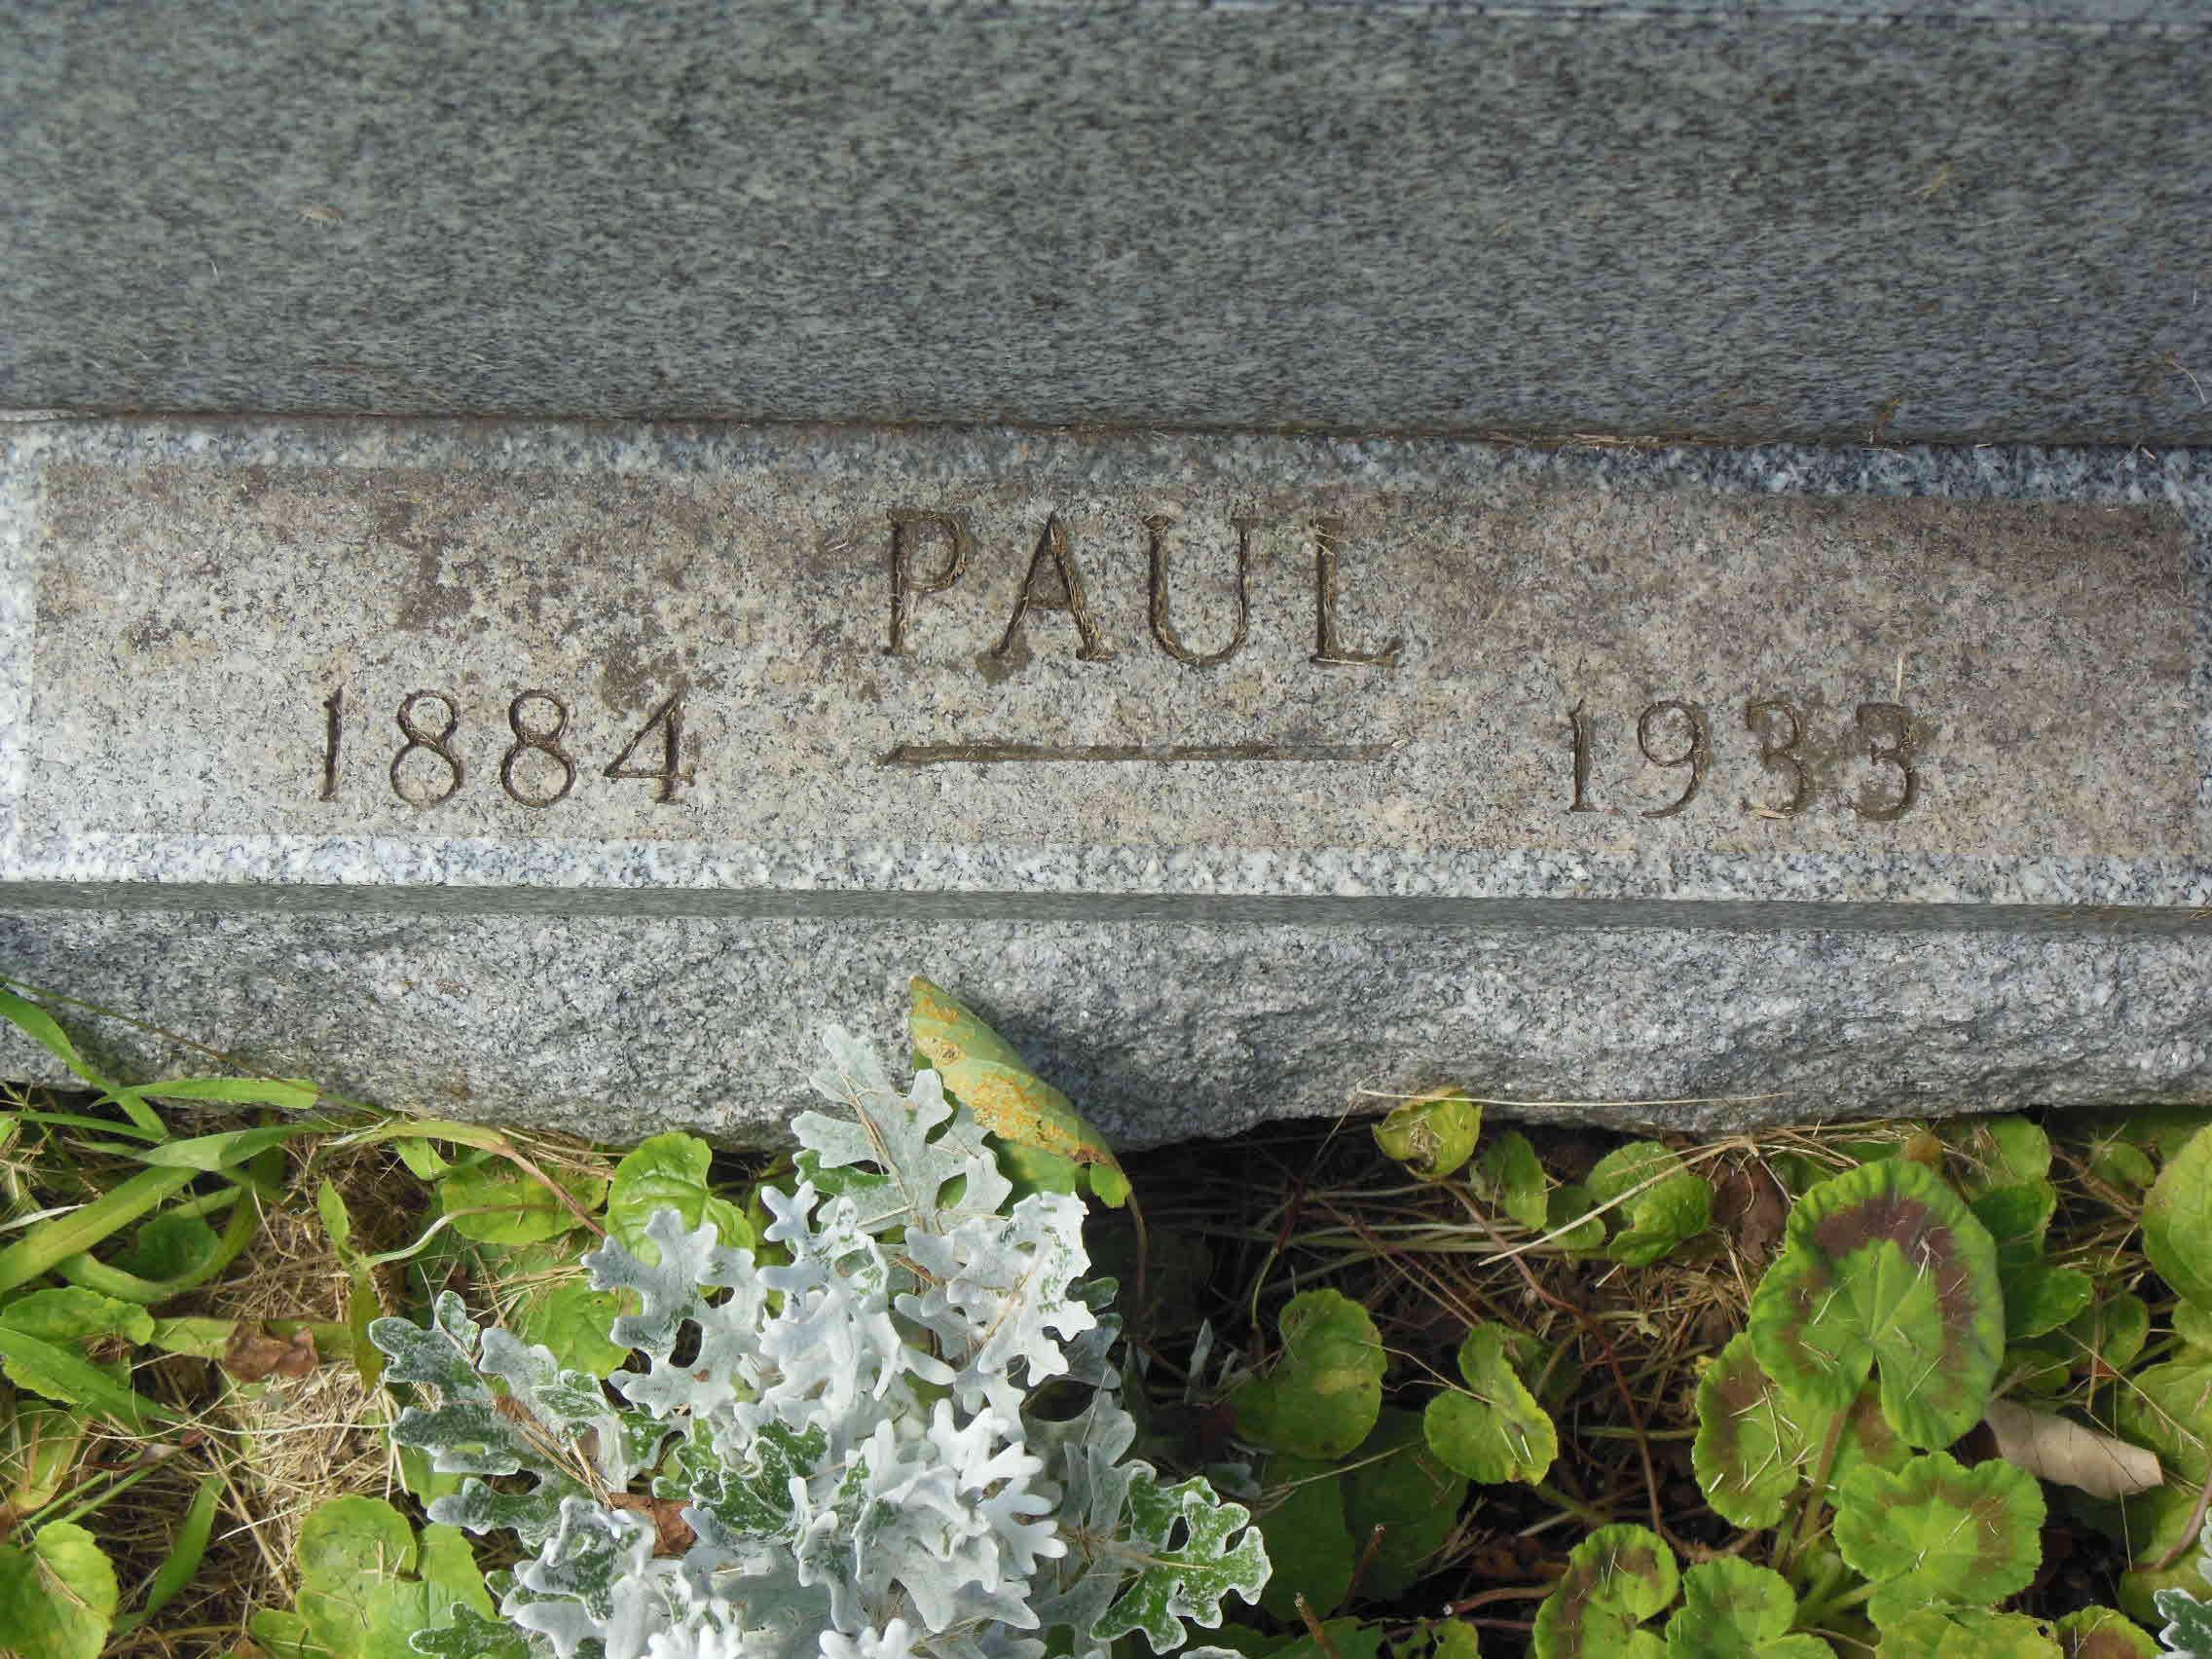 Paul Apostolo